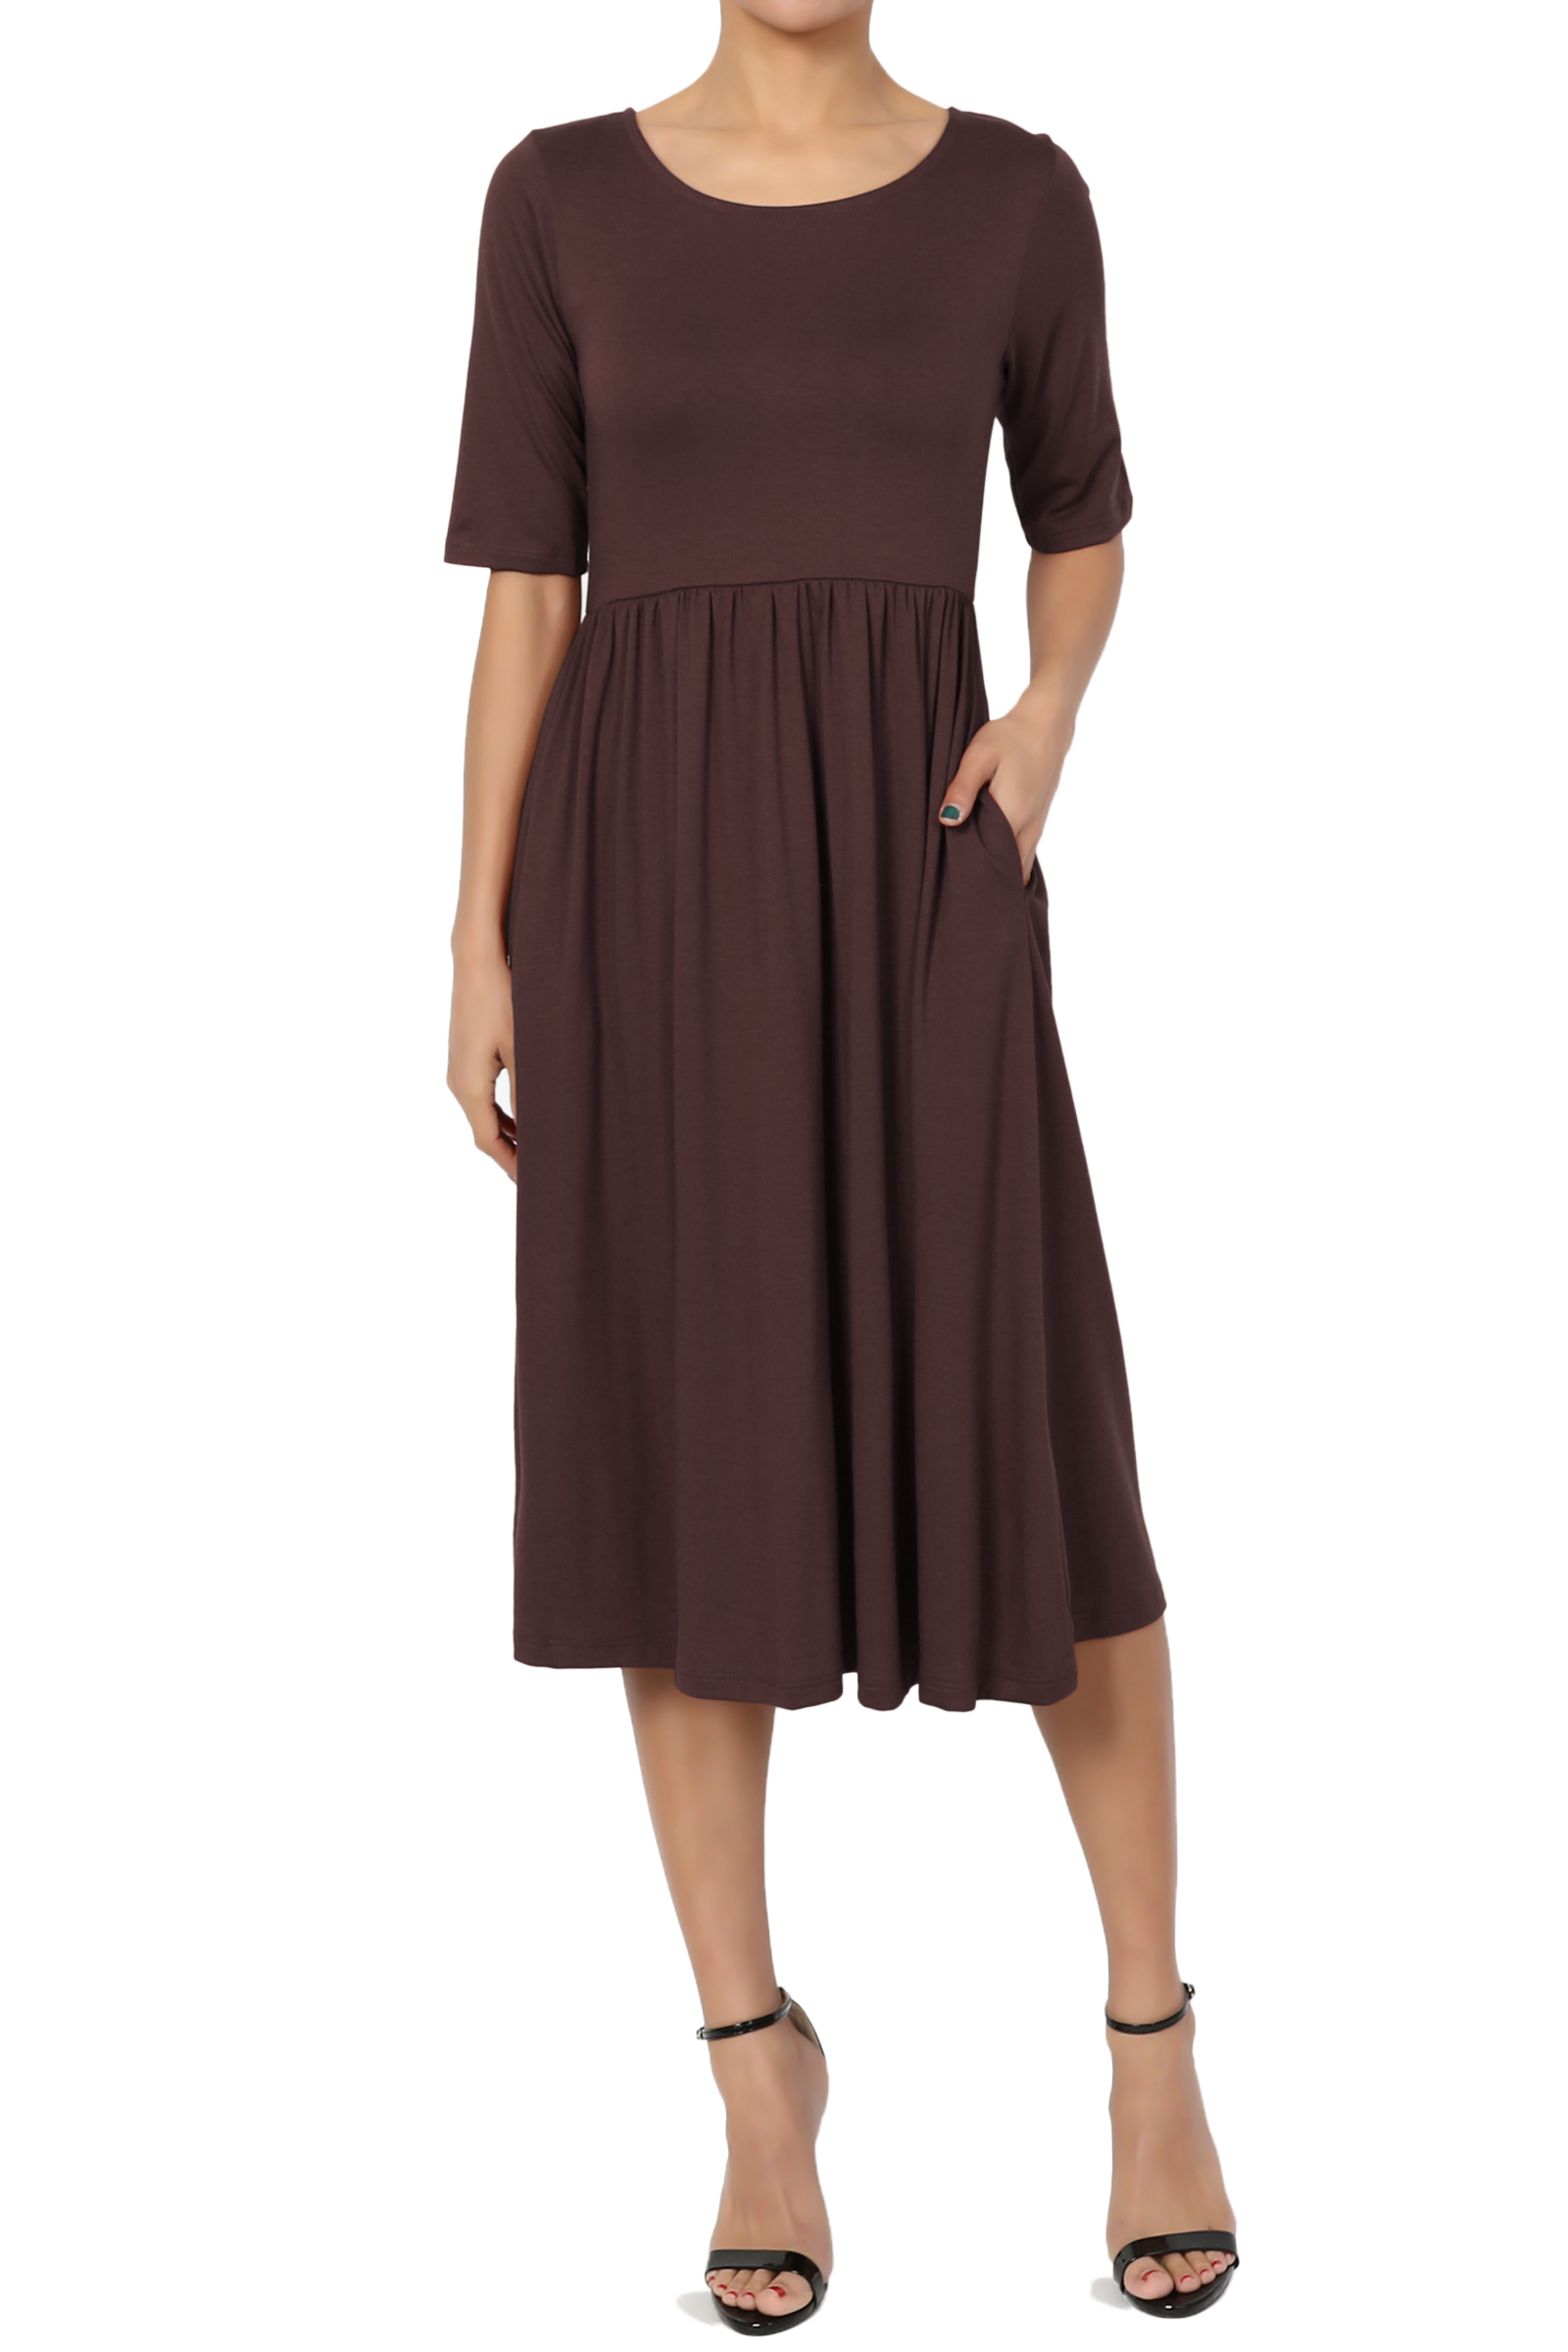 TheMogan Women's 1/2 Short Sleeve Pleated Empire Waist Fit & Flare Pocket Dress